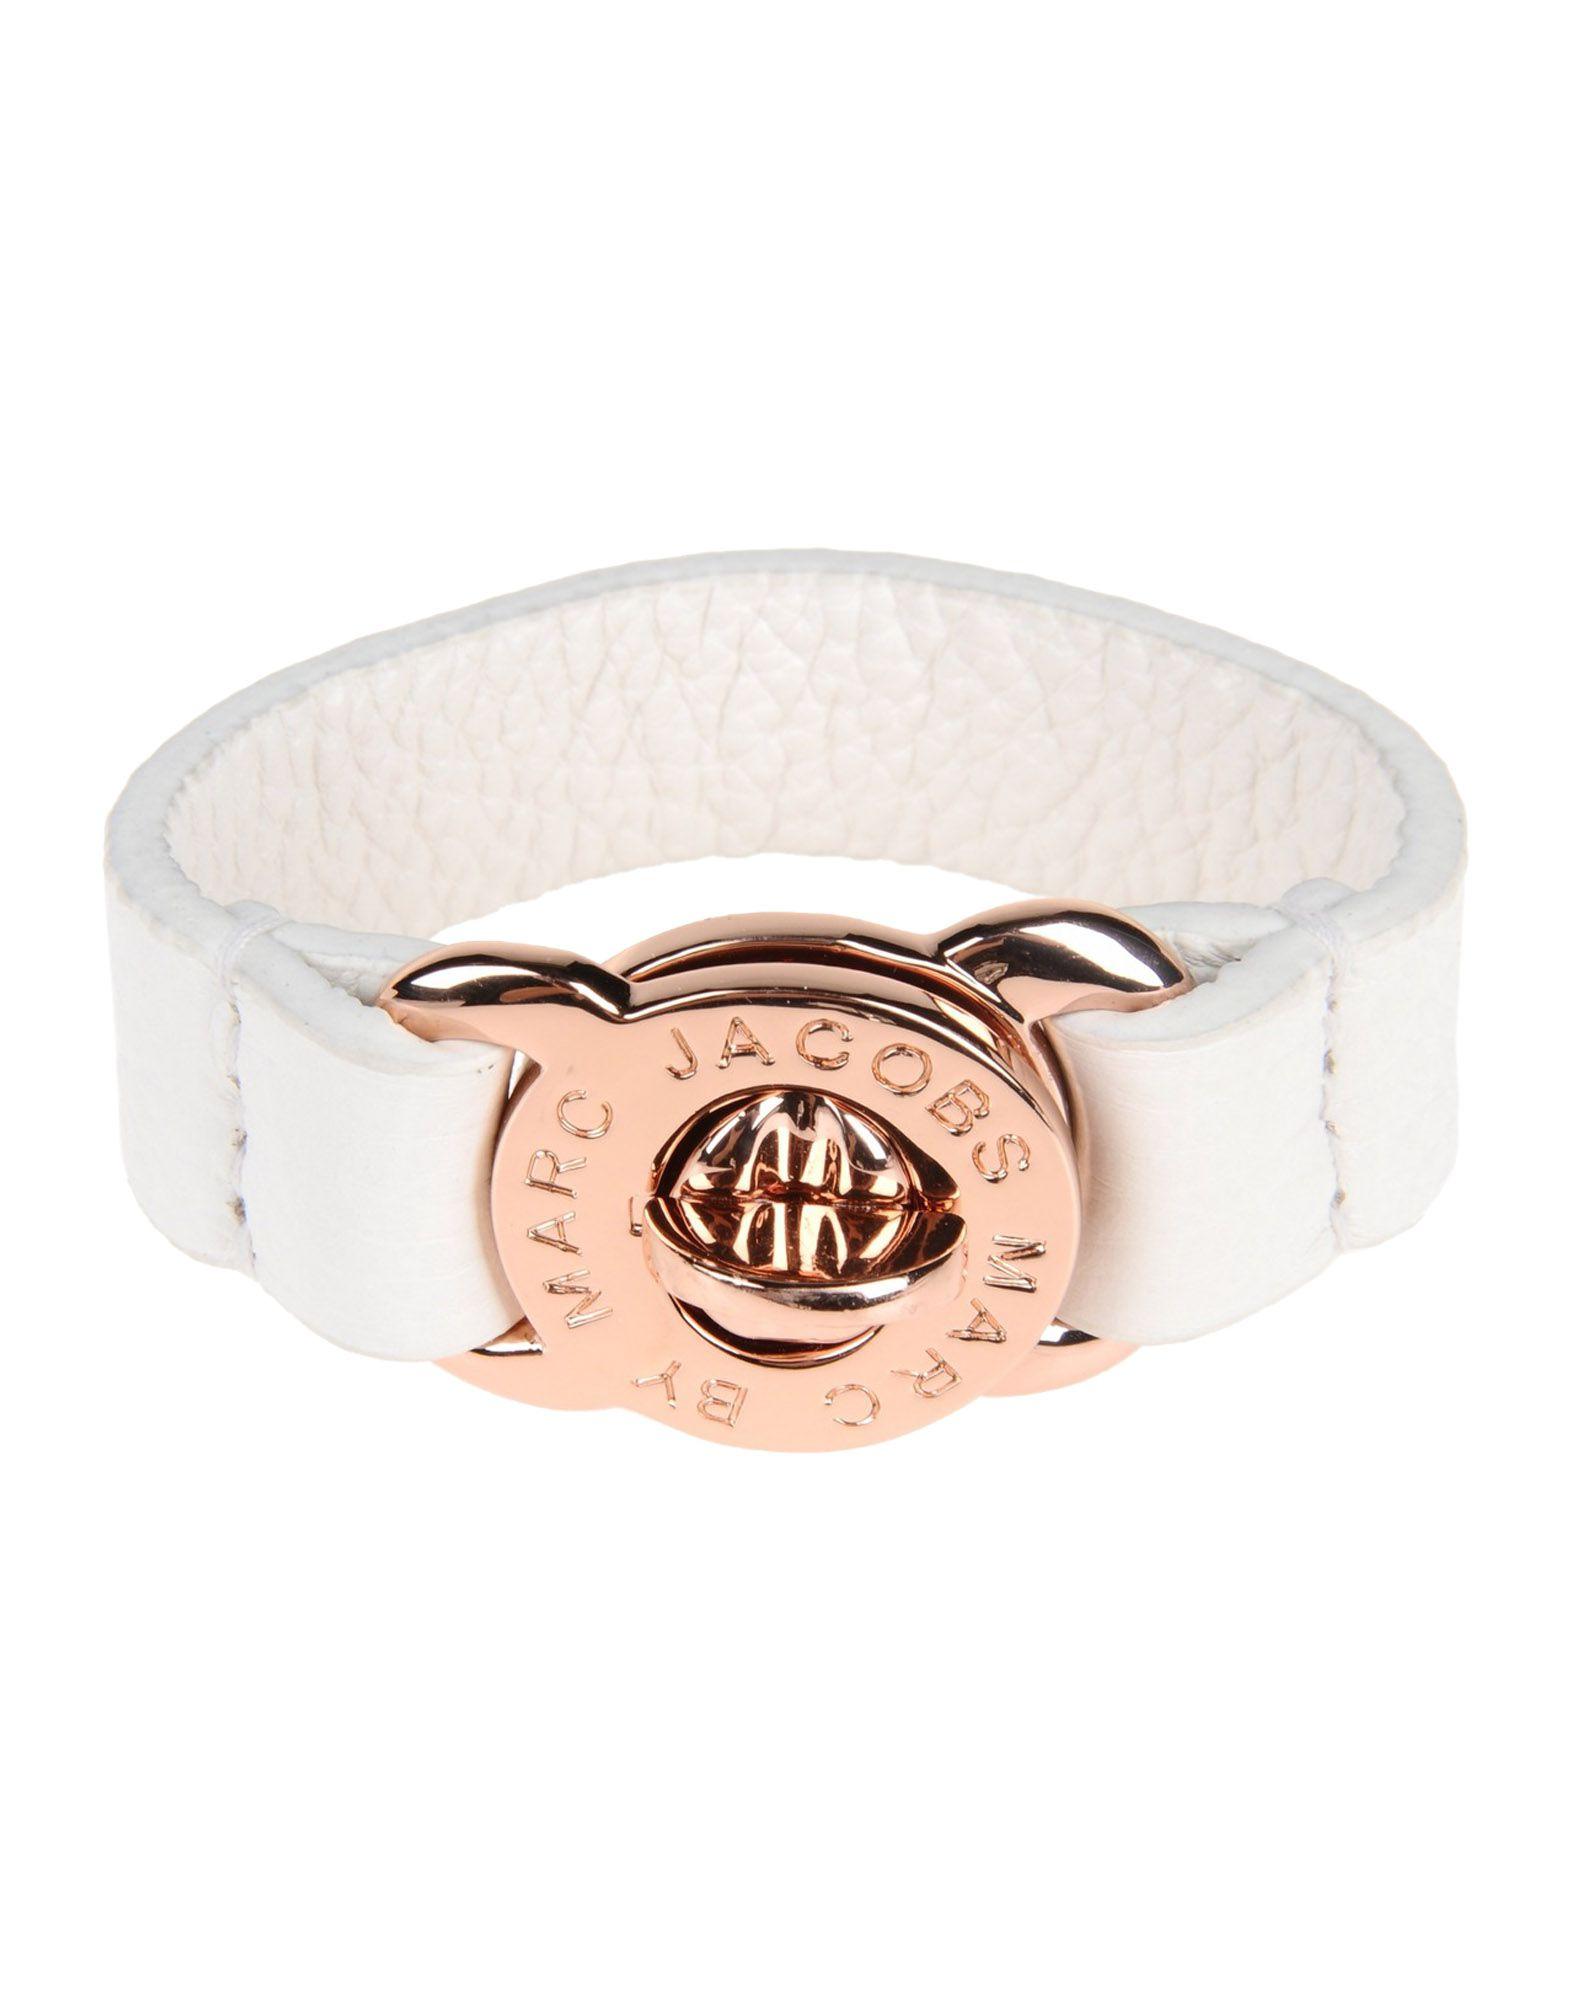 MARC BY MARC JACOBS Bracelets